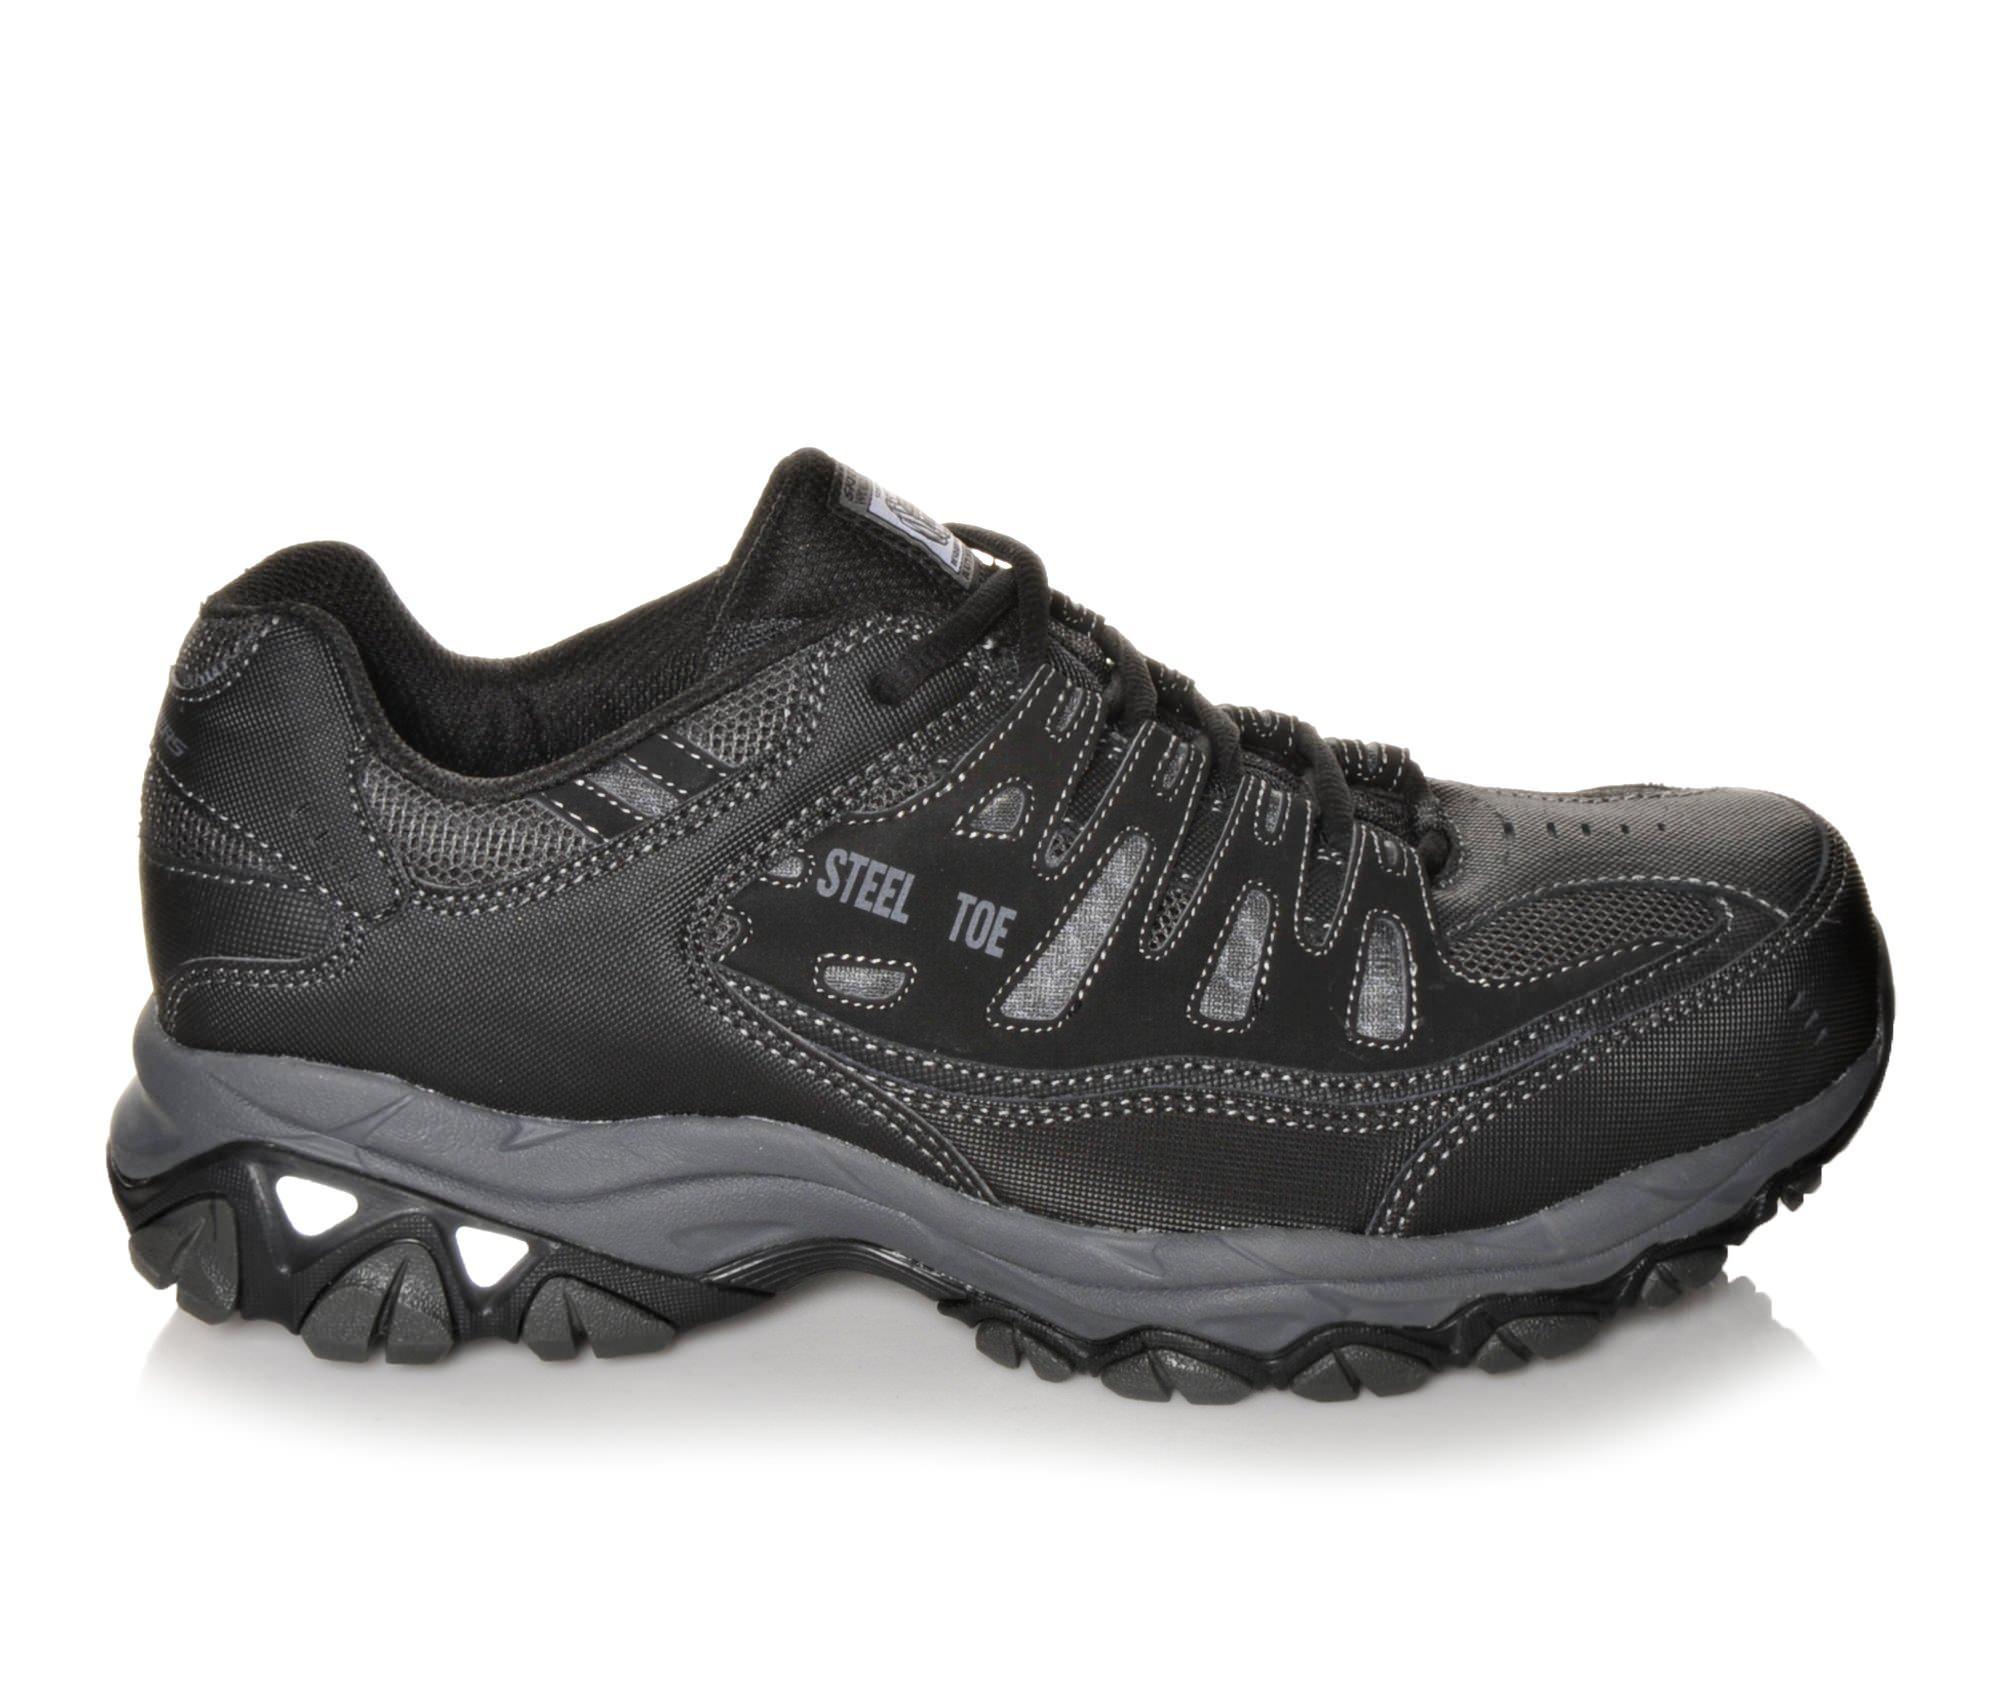 Skechers Work 77055 Cankton Steel Toe Men's Boots (Black Canvas)